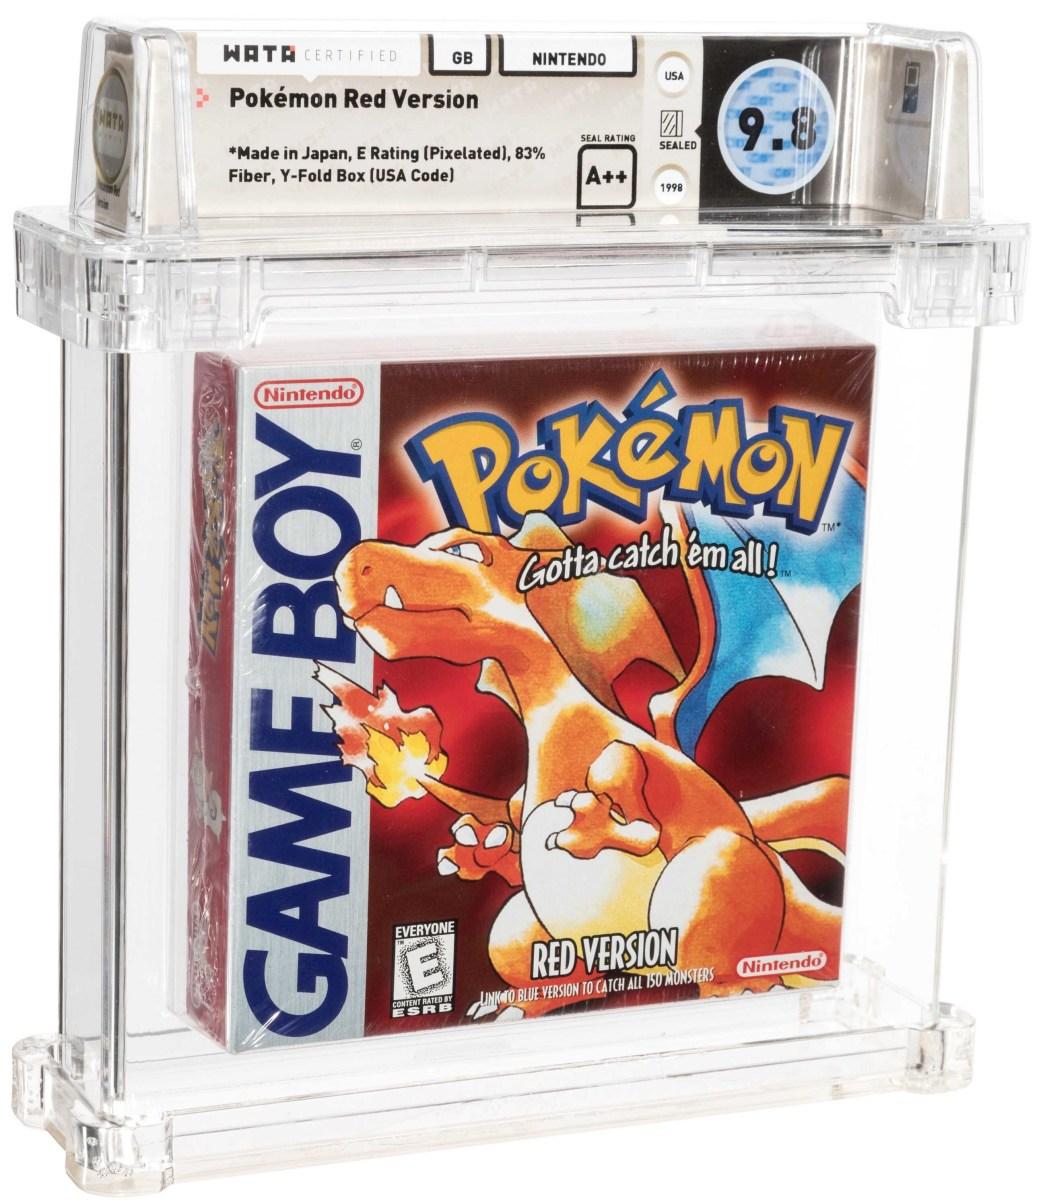 Game Boy Pokémon Red Version